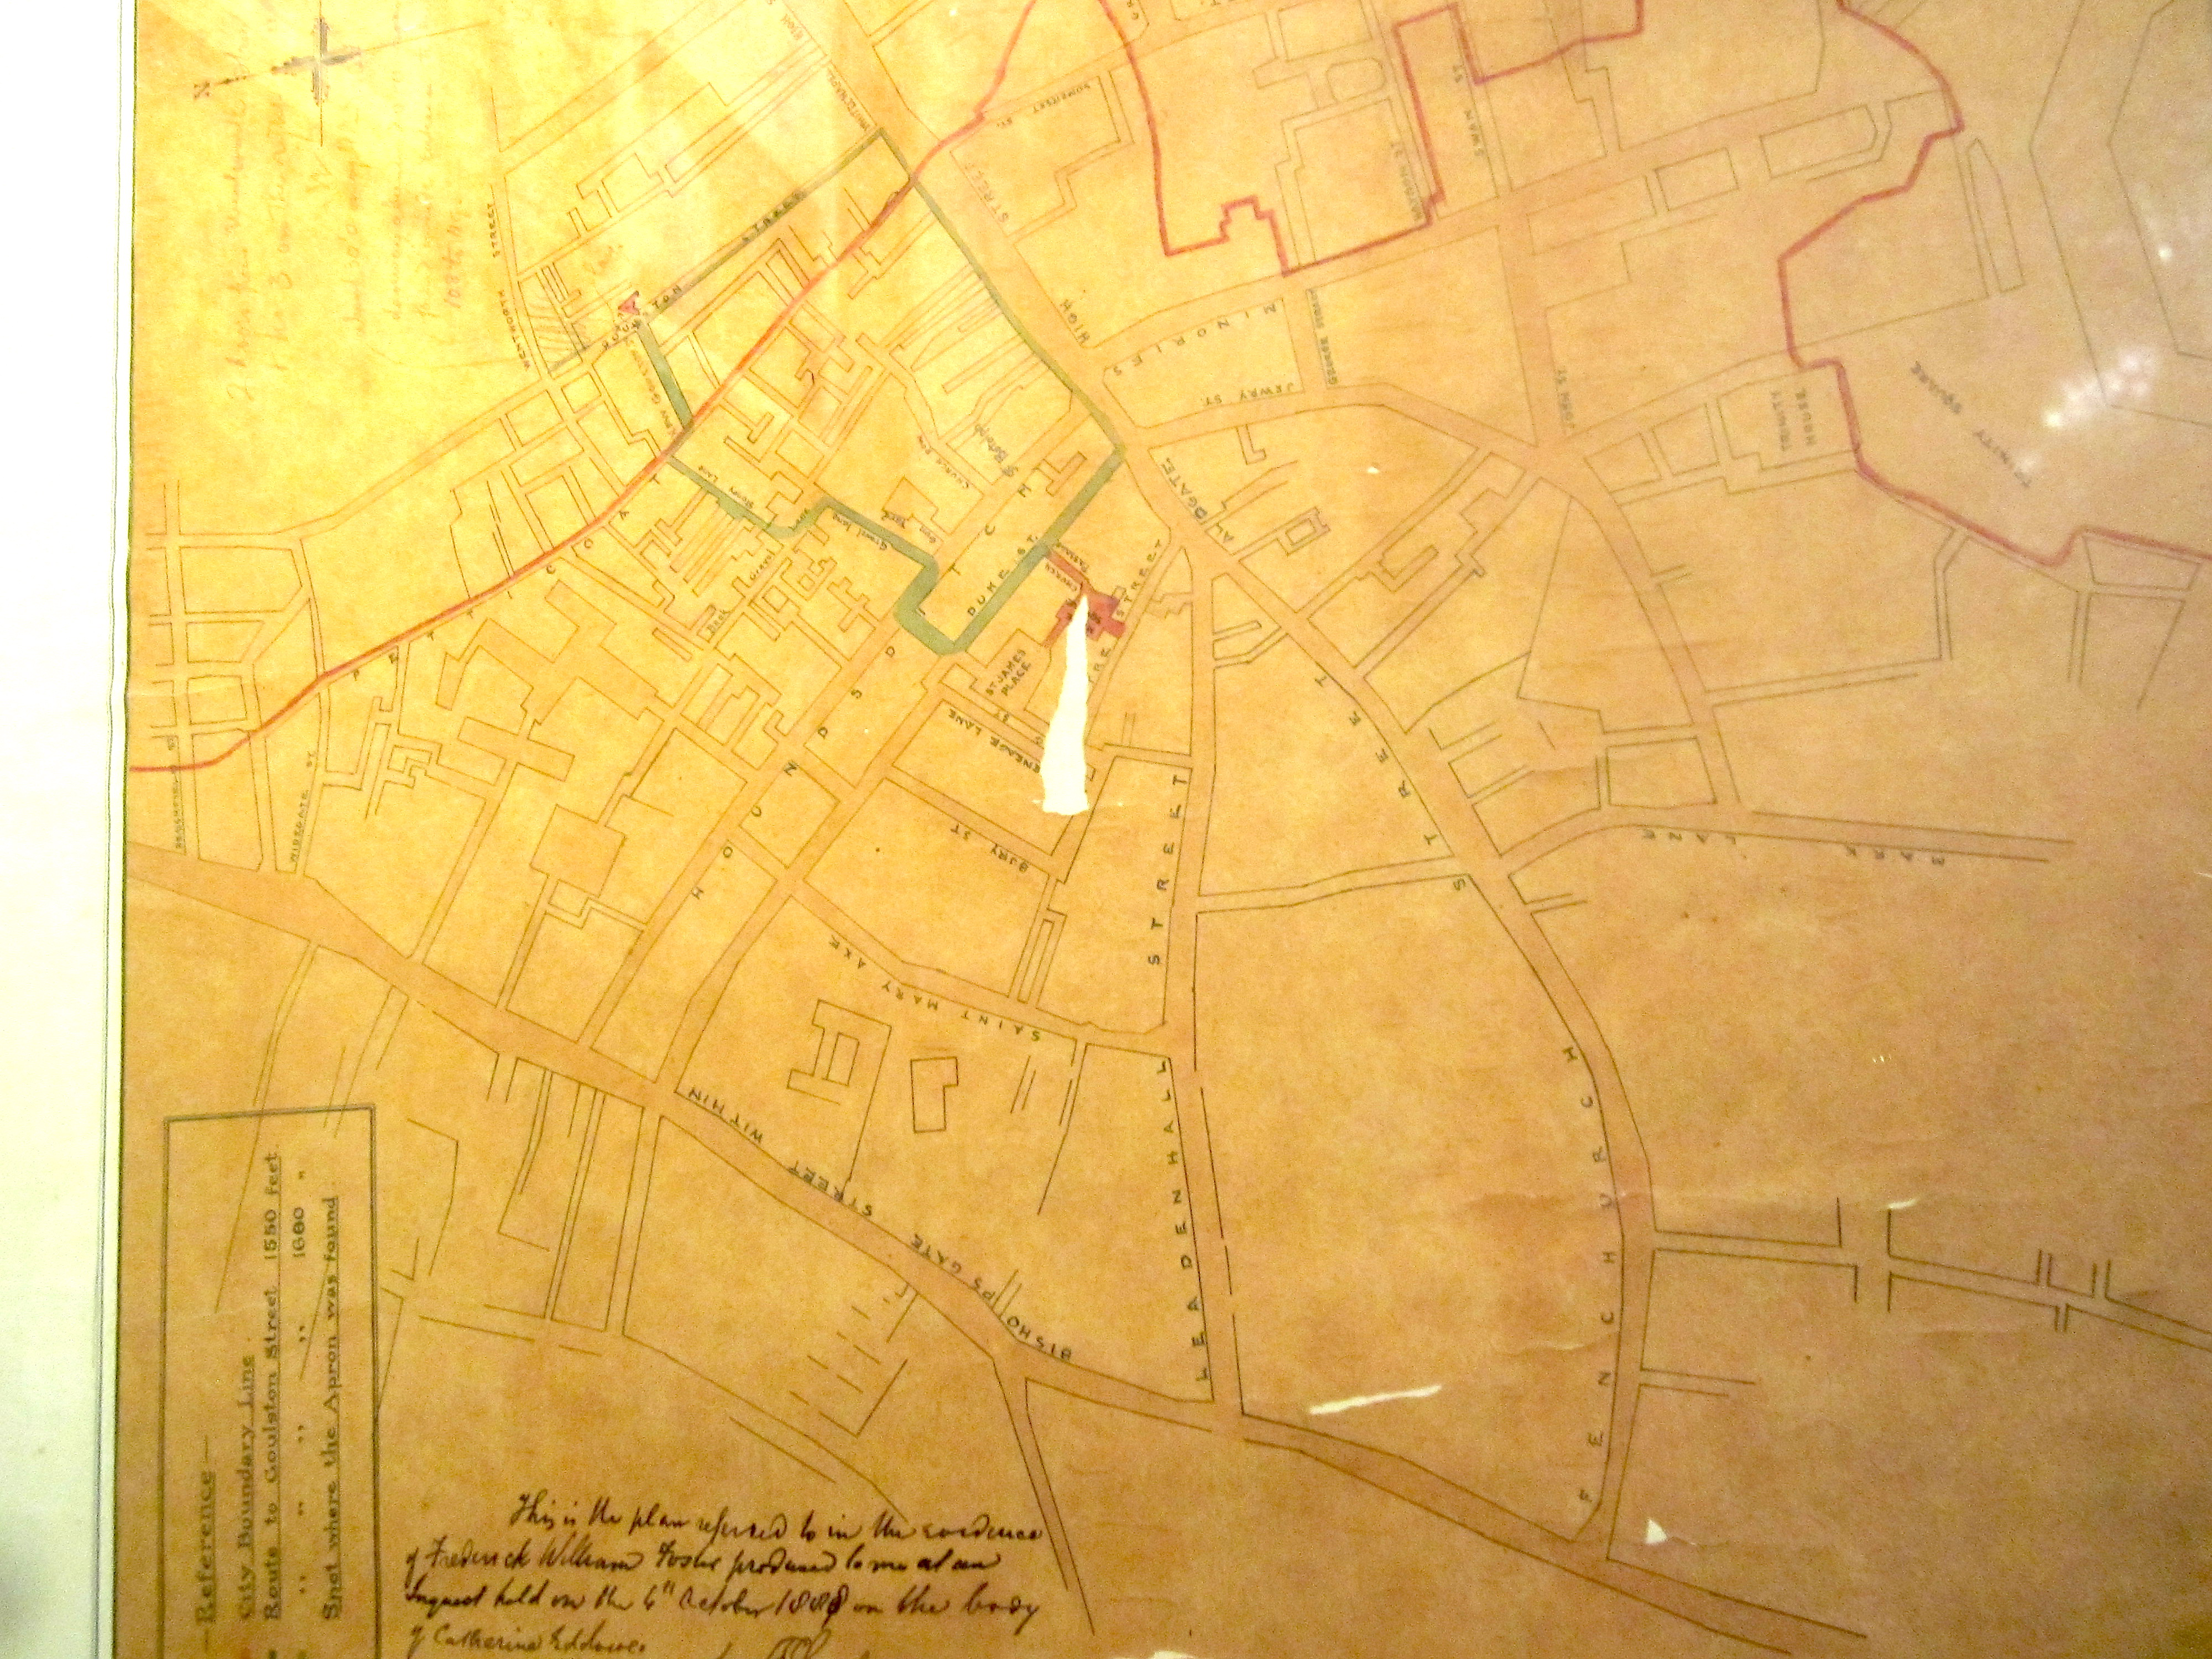 whitechapel1888map